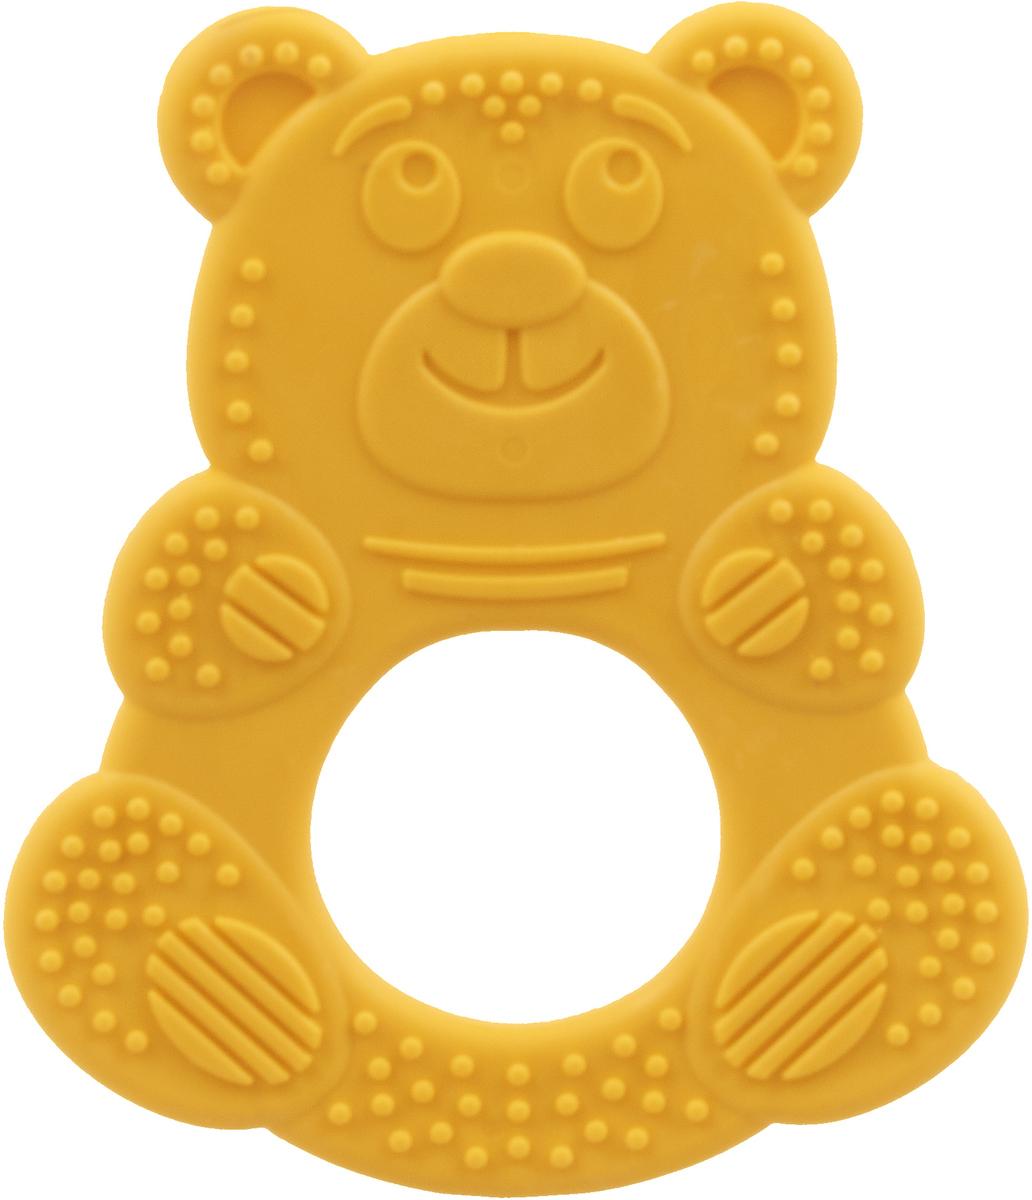 Пластмастер Прорезыватель Миша цвет желтый пластмастер прорезыватель миша цвет желтый